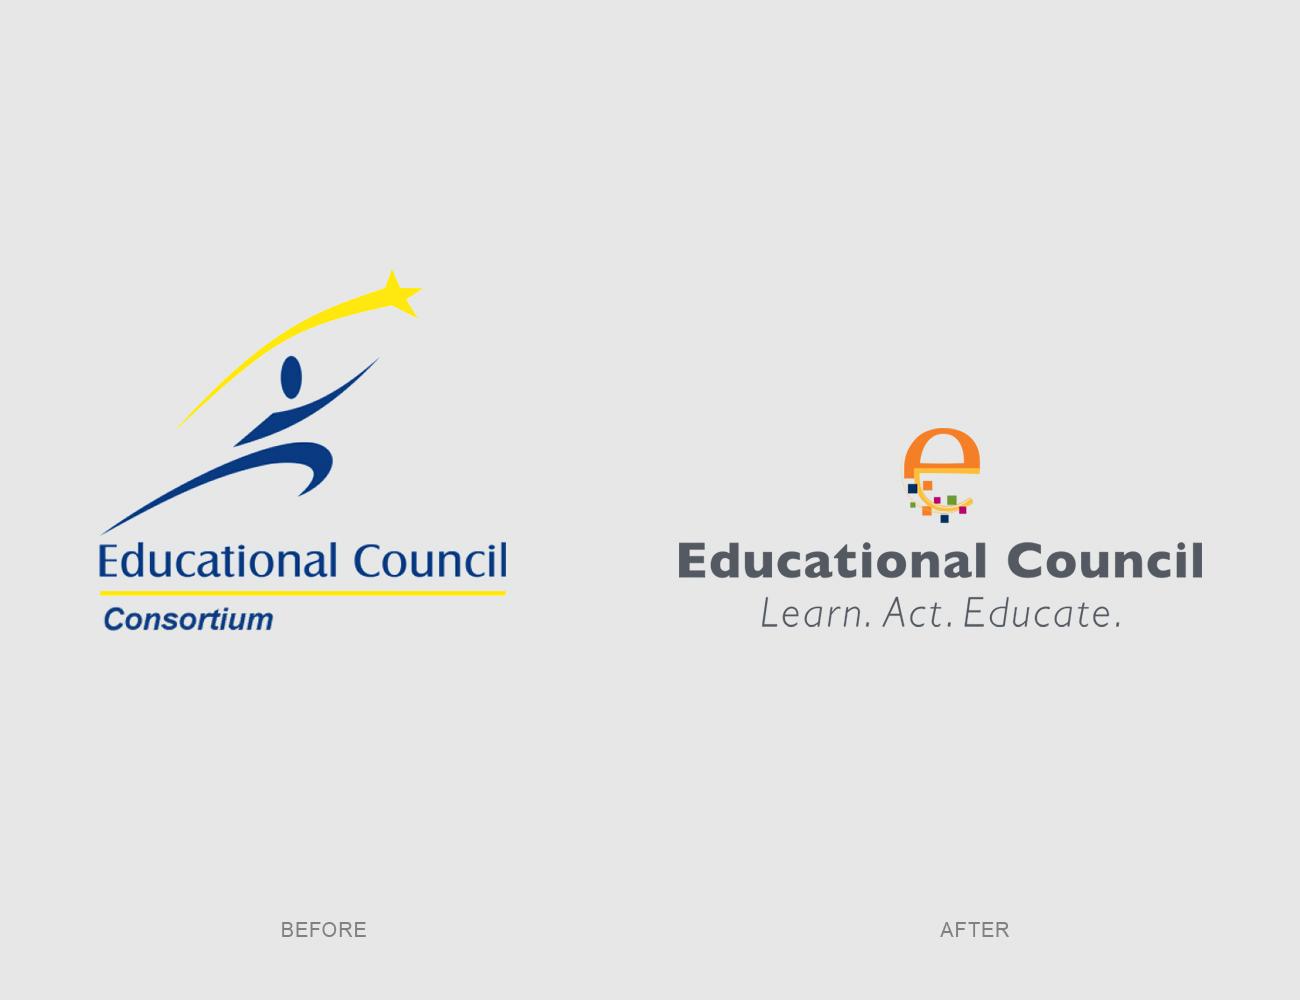 ecf-logo-before-after.jpg